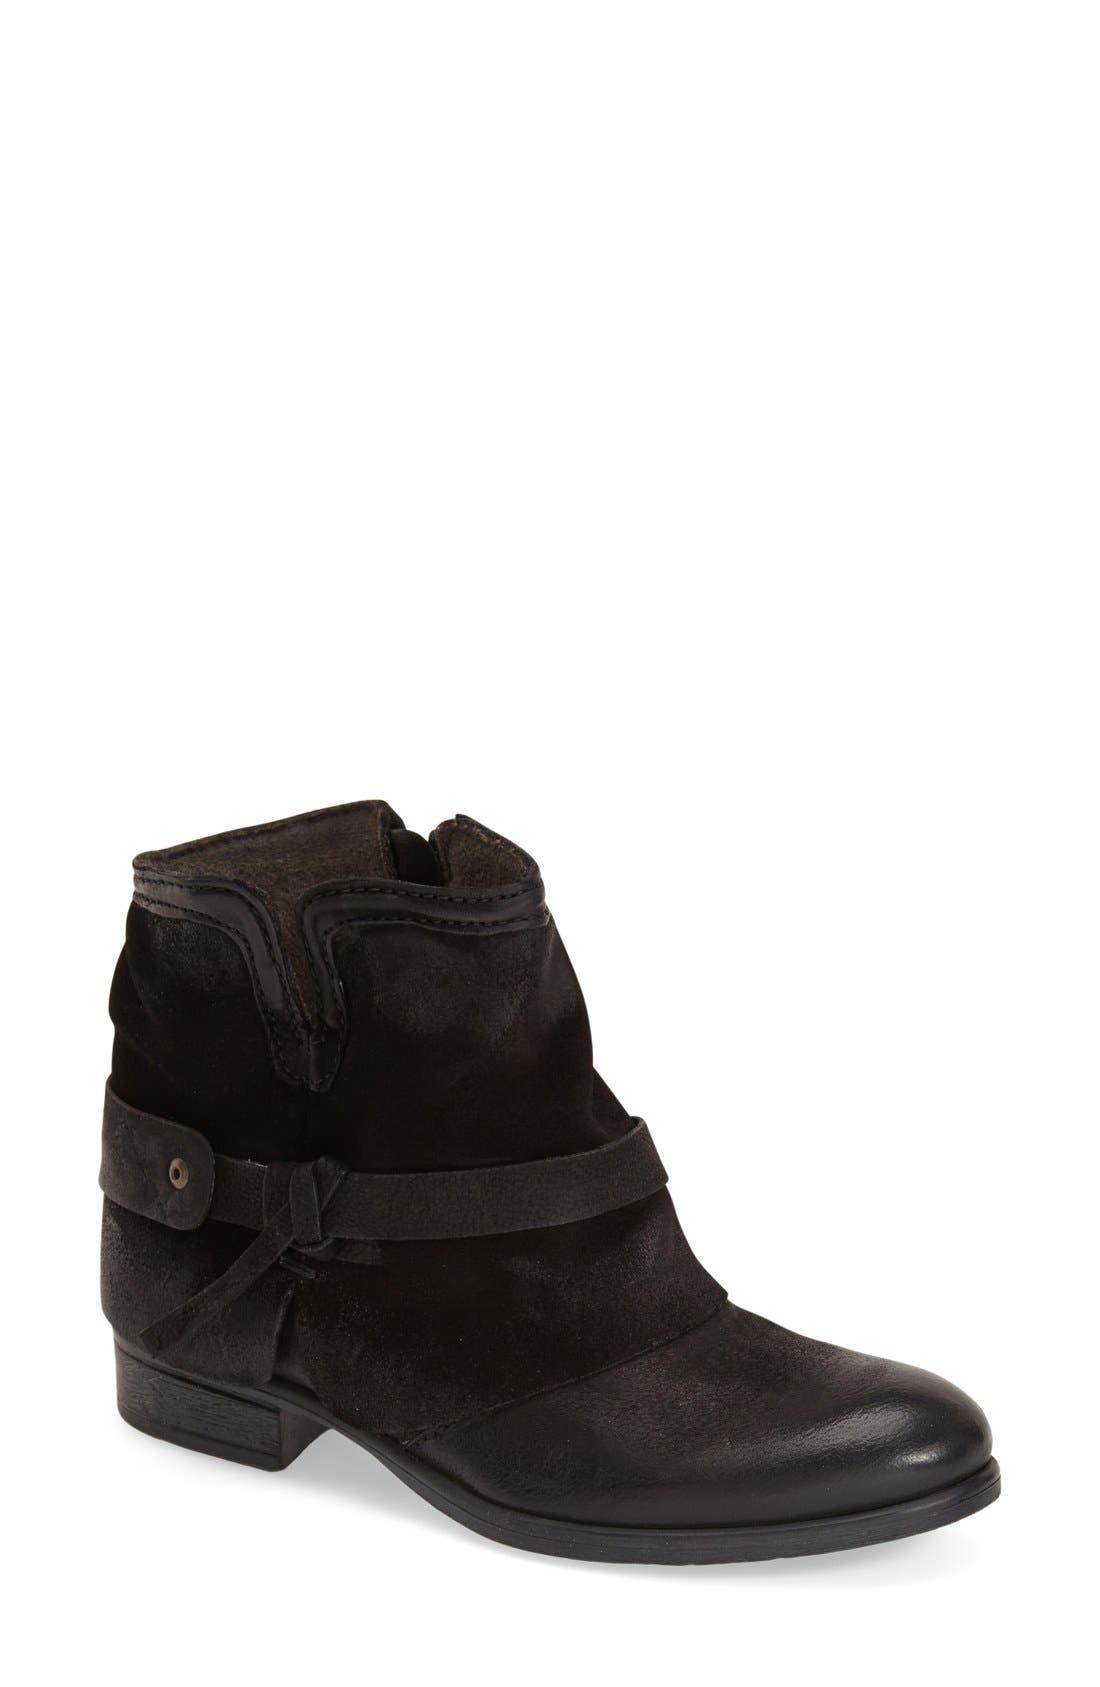 Alternate Image 1 Selected - Miz Mooz 'Seymour' Boot (Women)